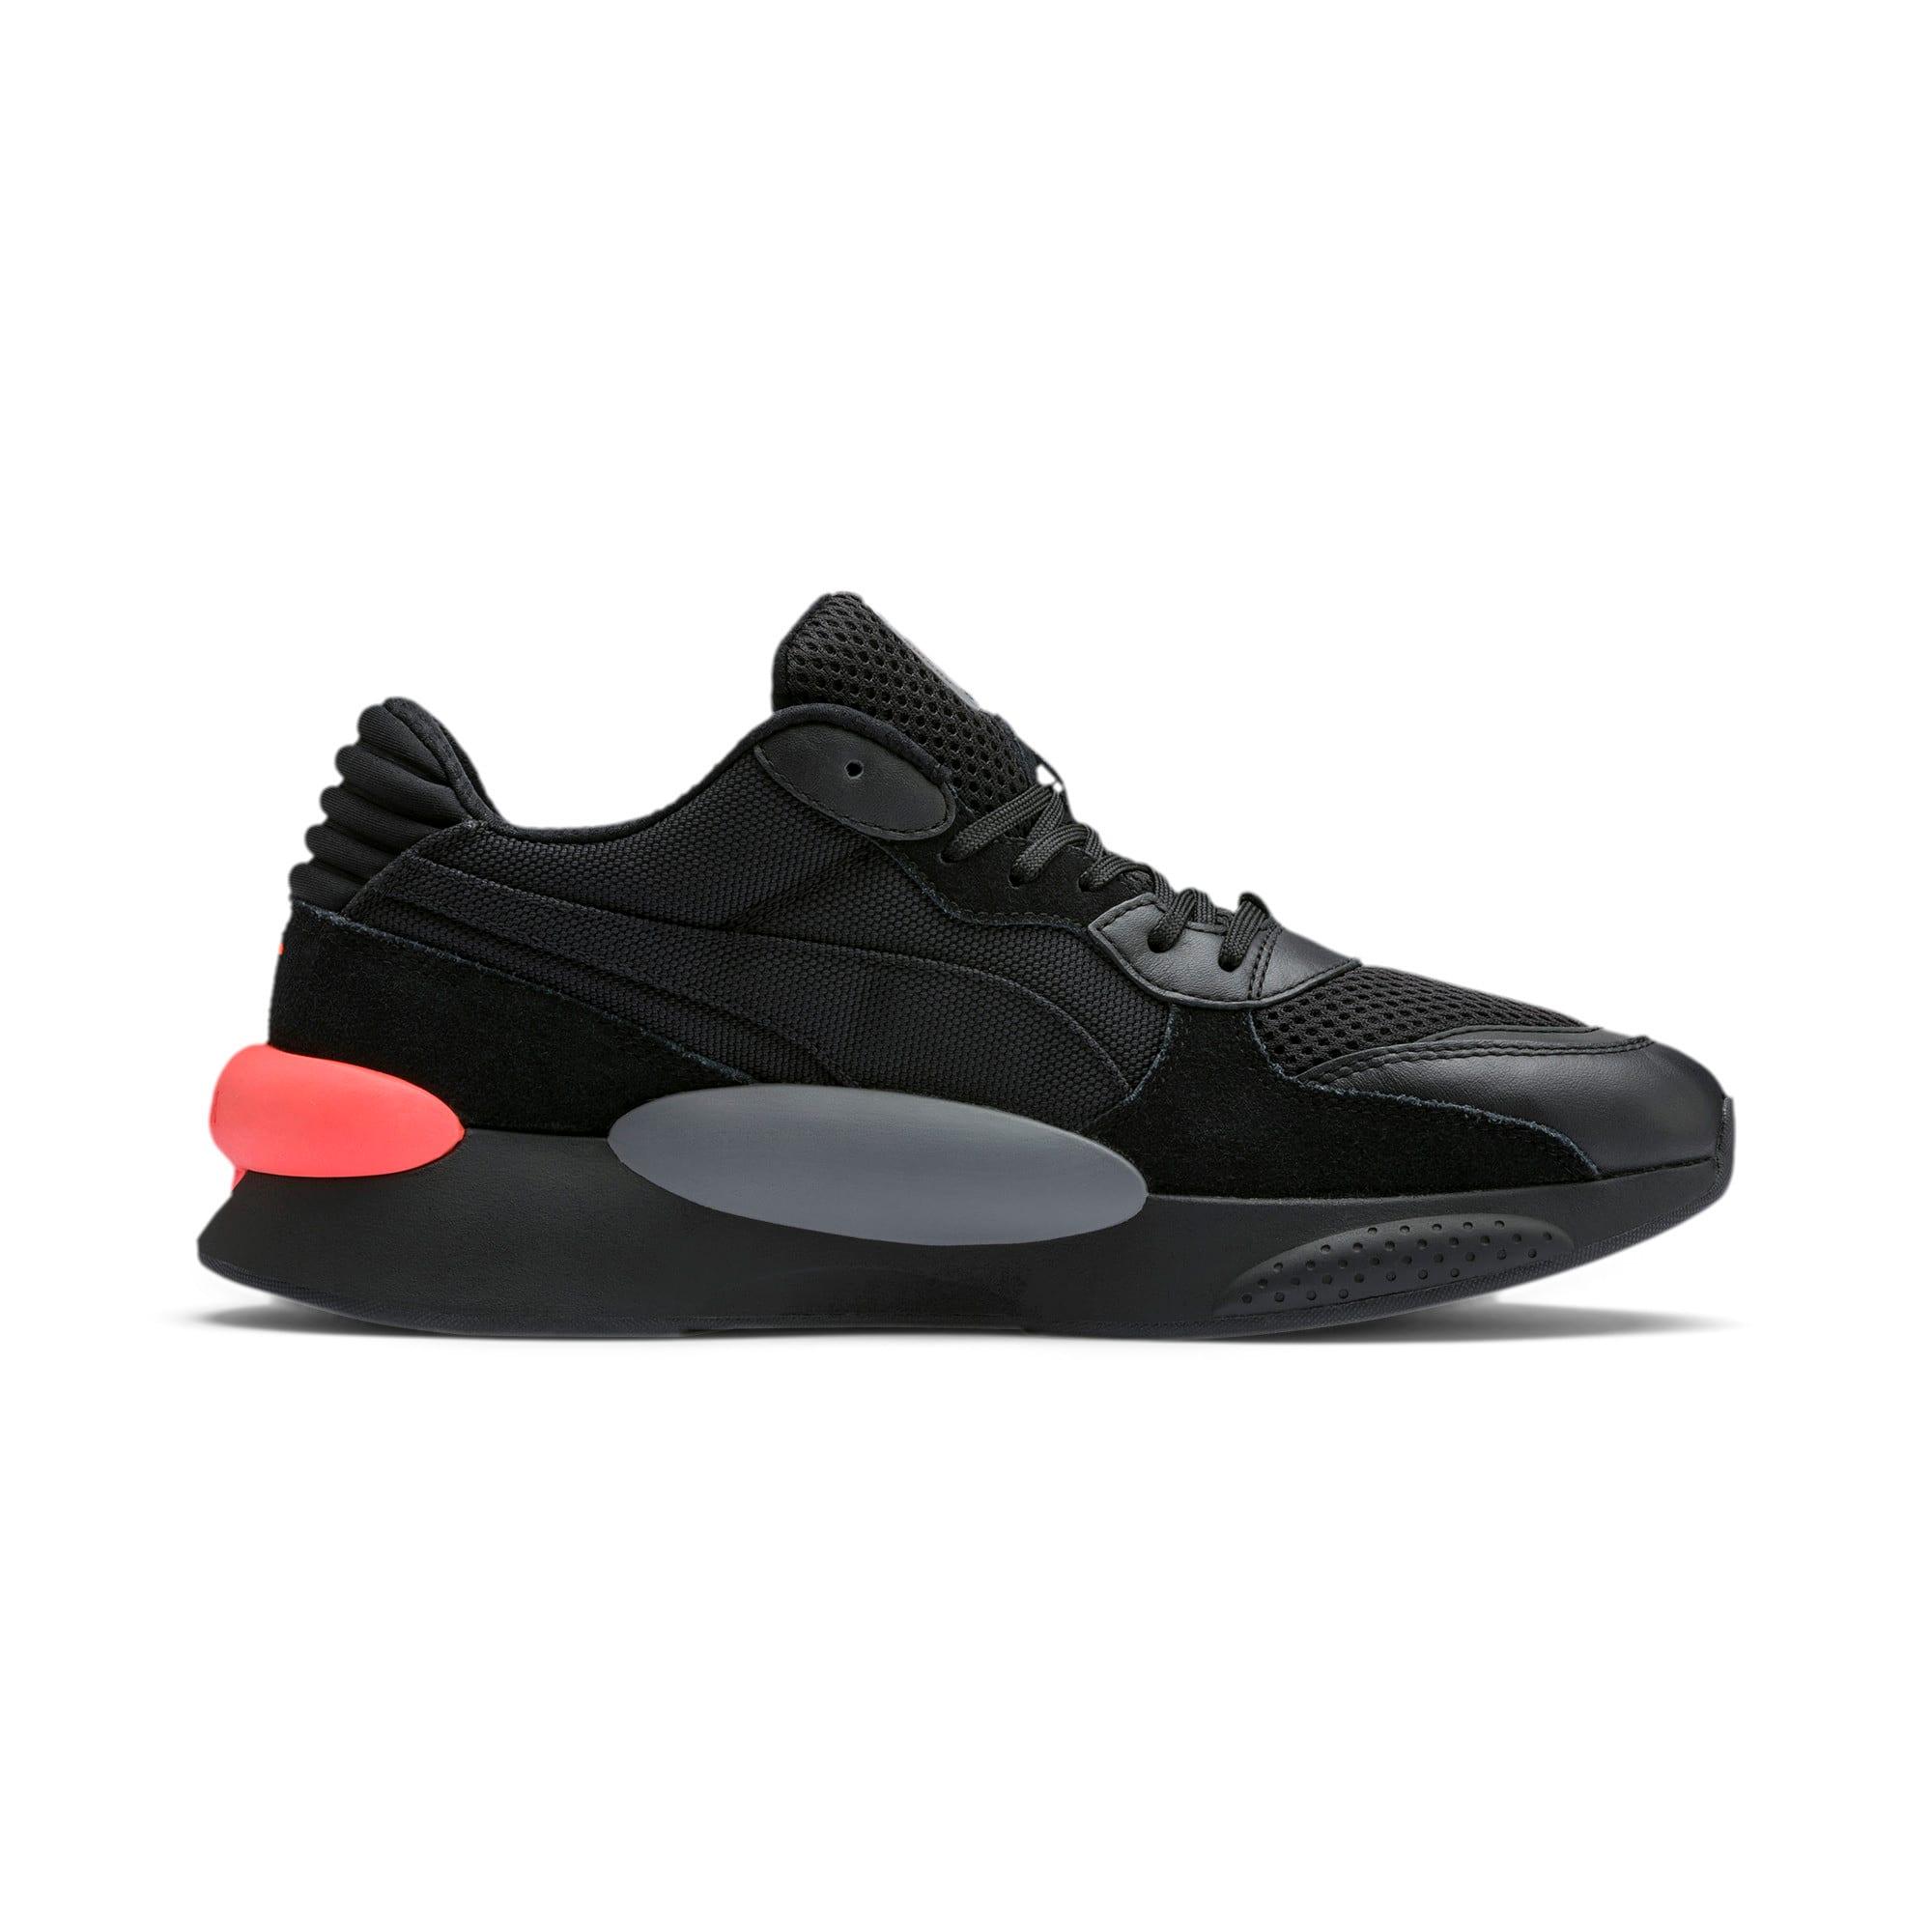 Thumbnail 5 of RS 9.8 Cosmic Sneakers, Puma Black, medium